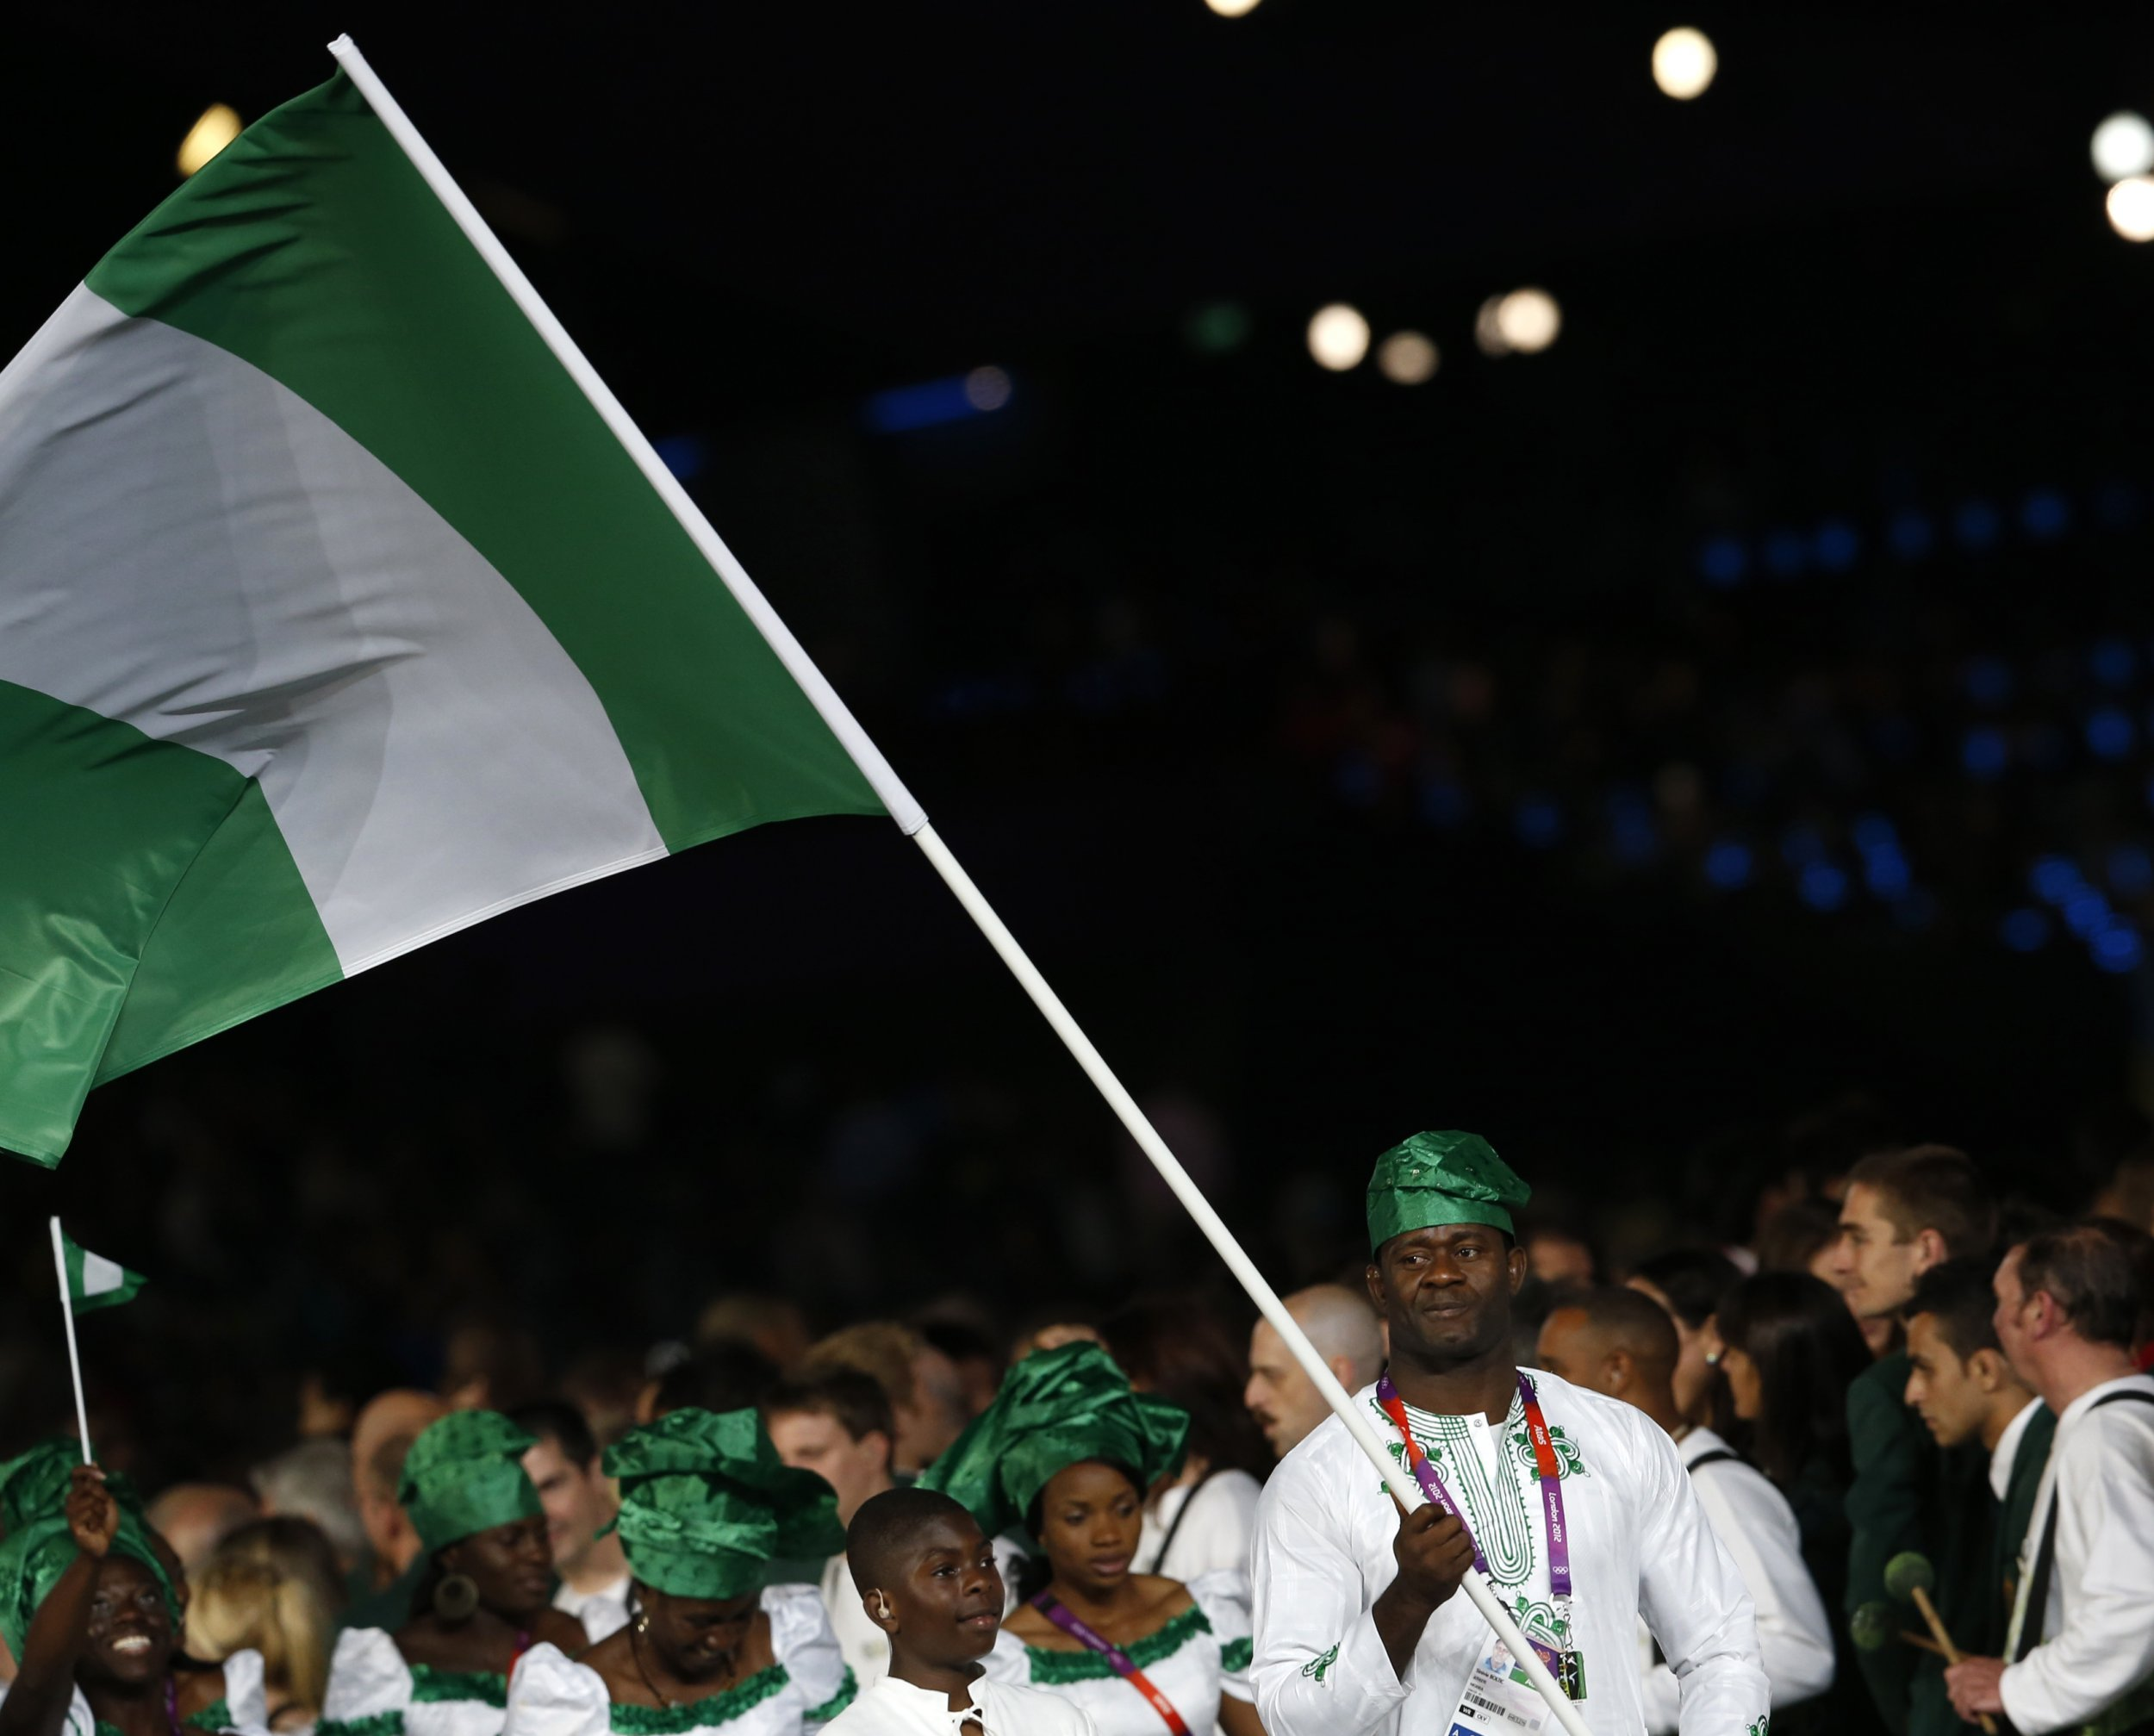 Nigeria London 2012 flagbearer